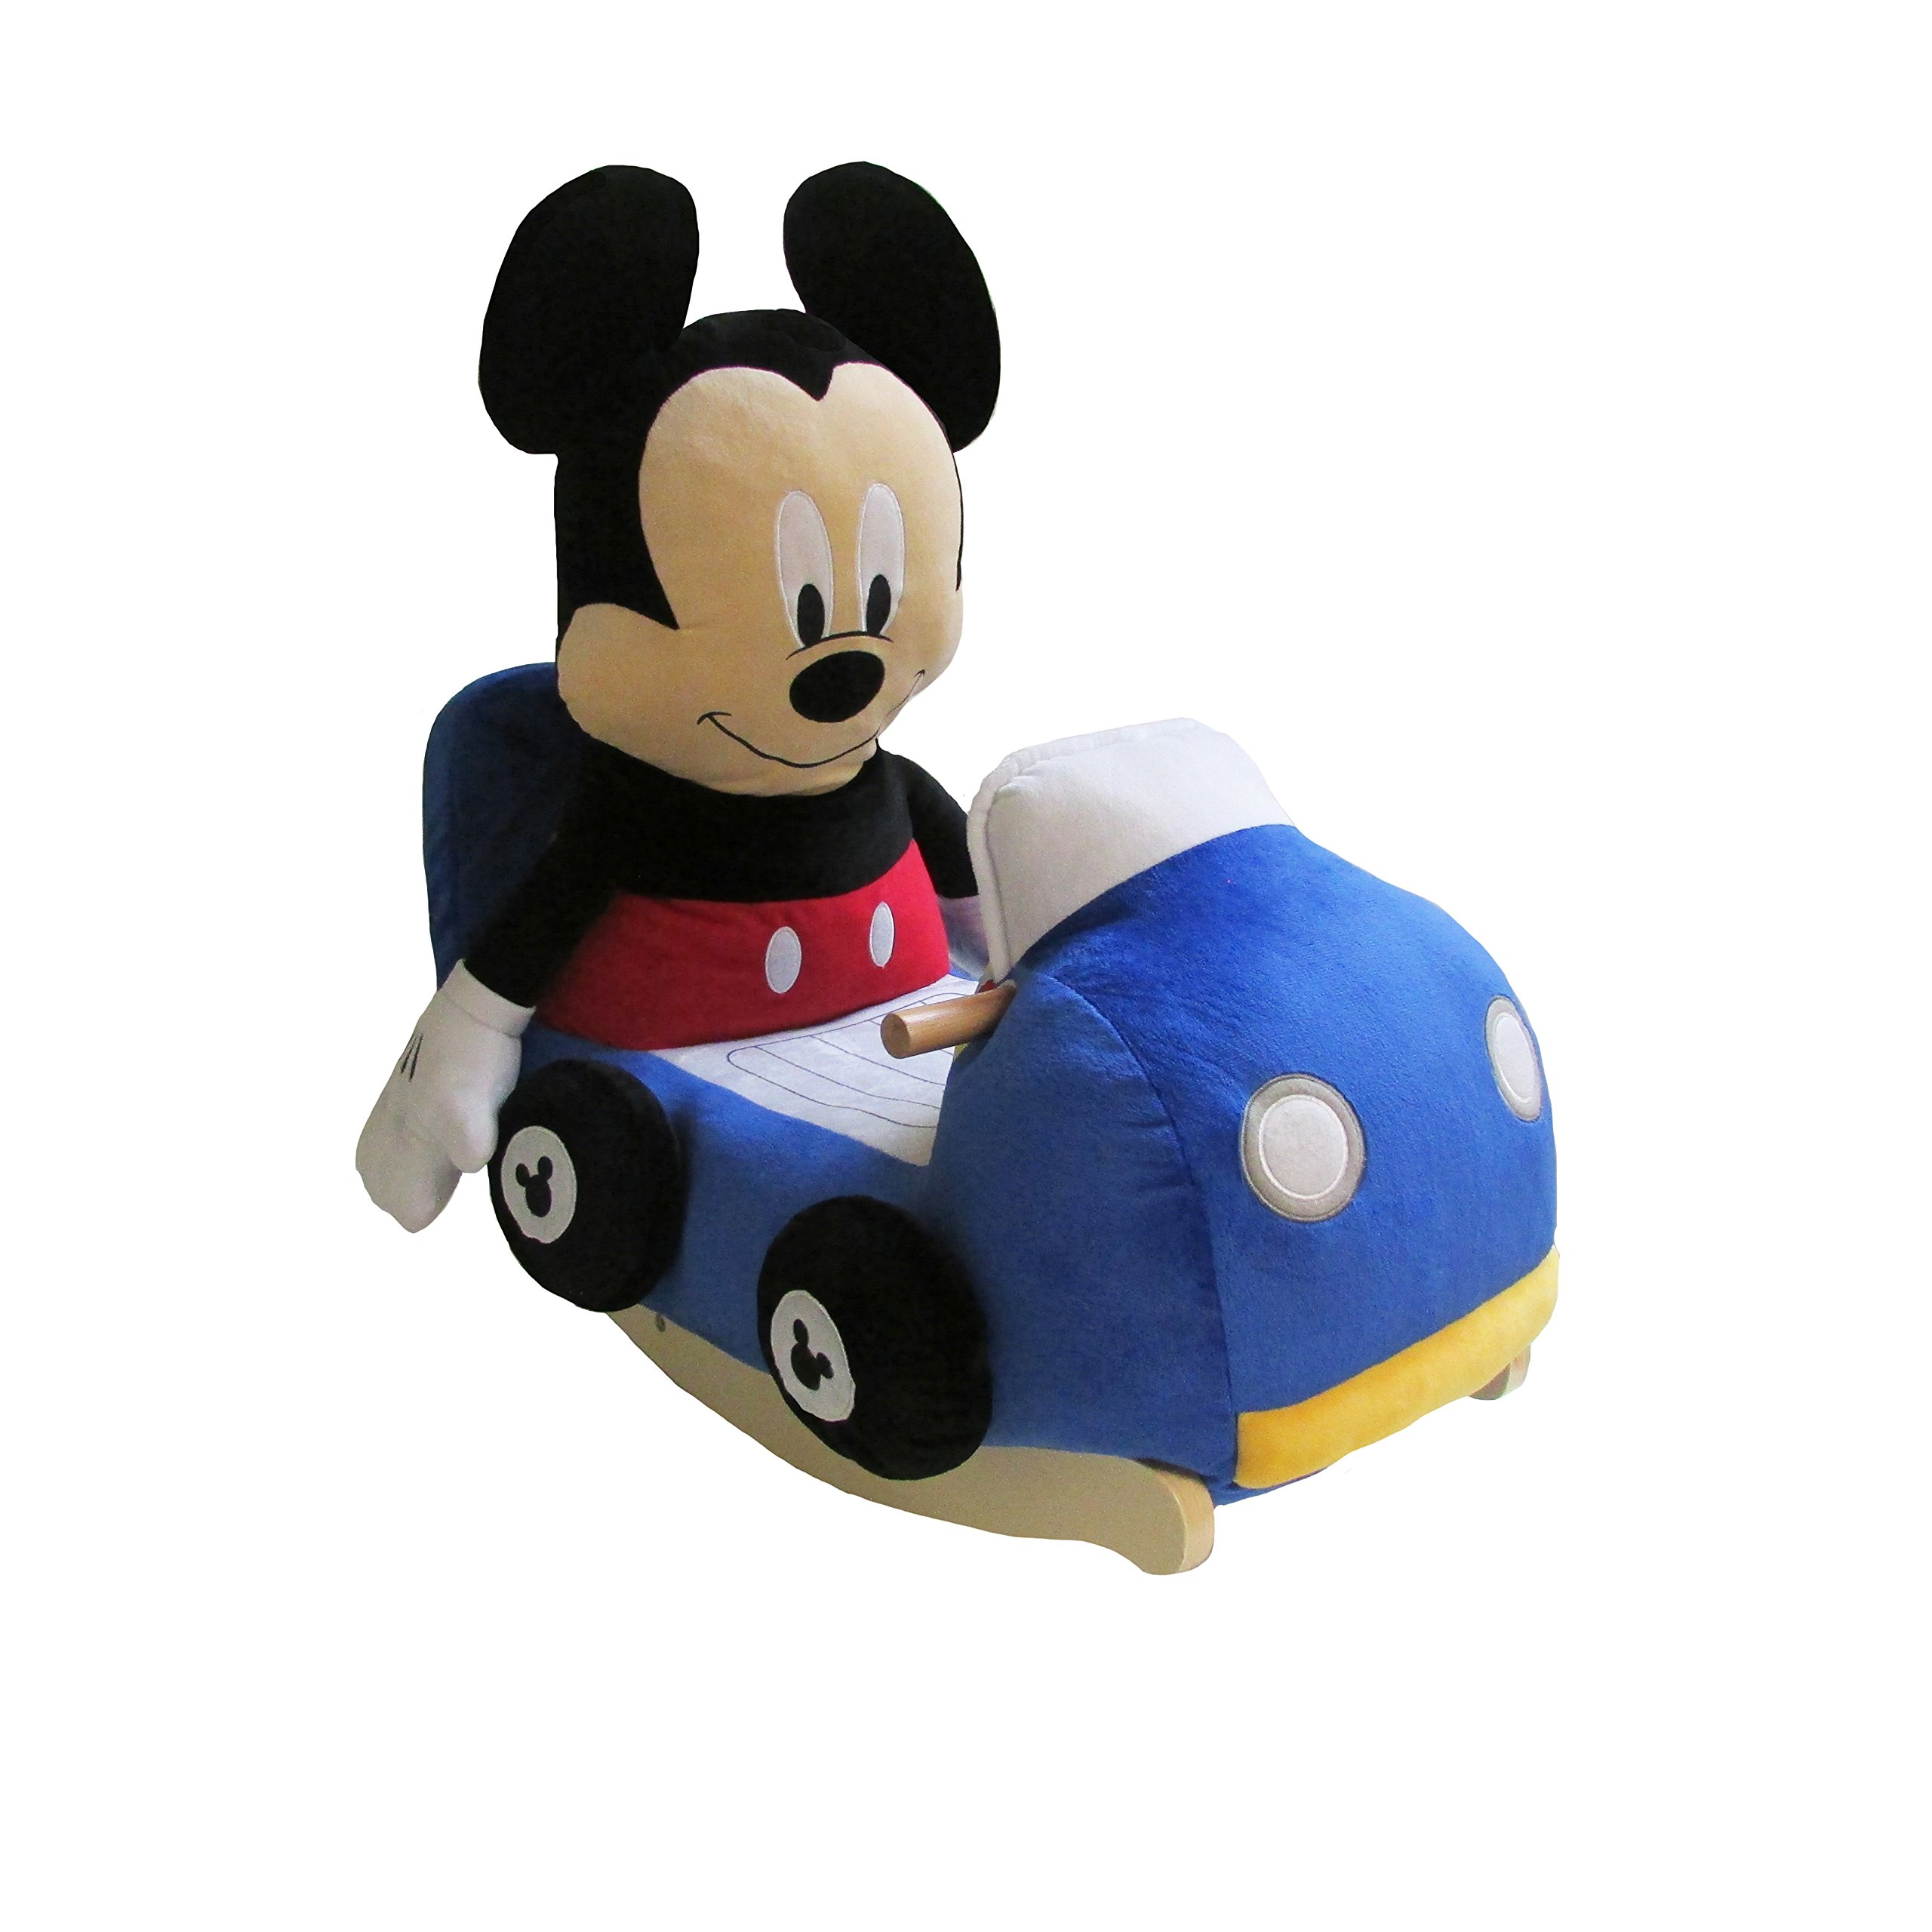 Disney Mickey Mouse Rocker by Disney (Image #1)